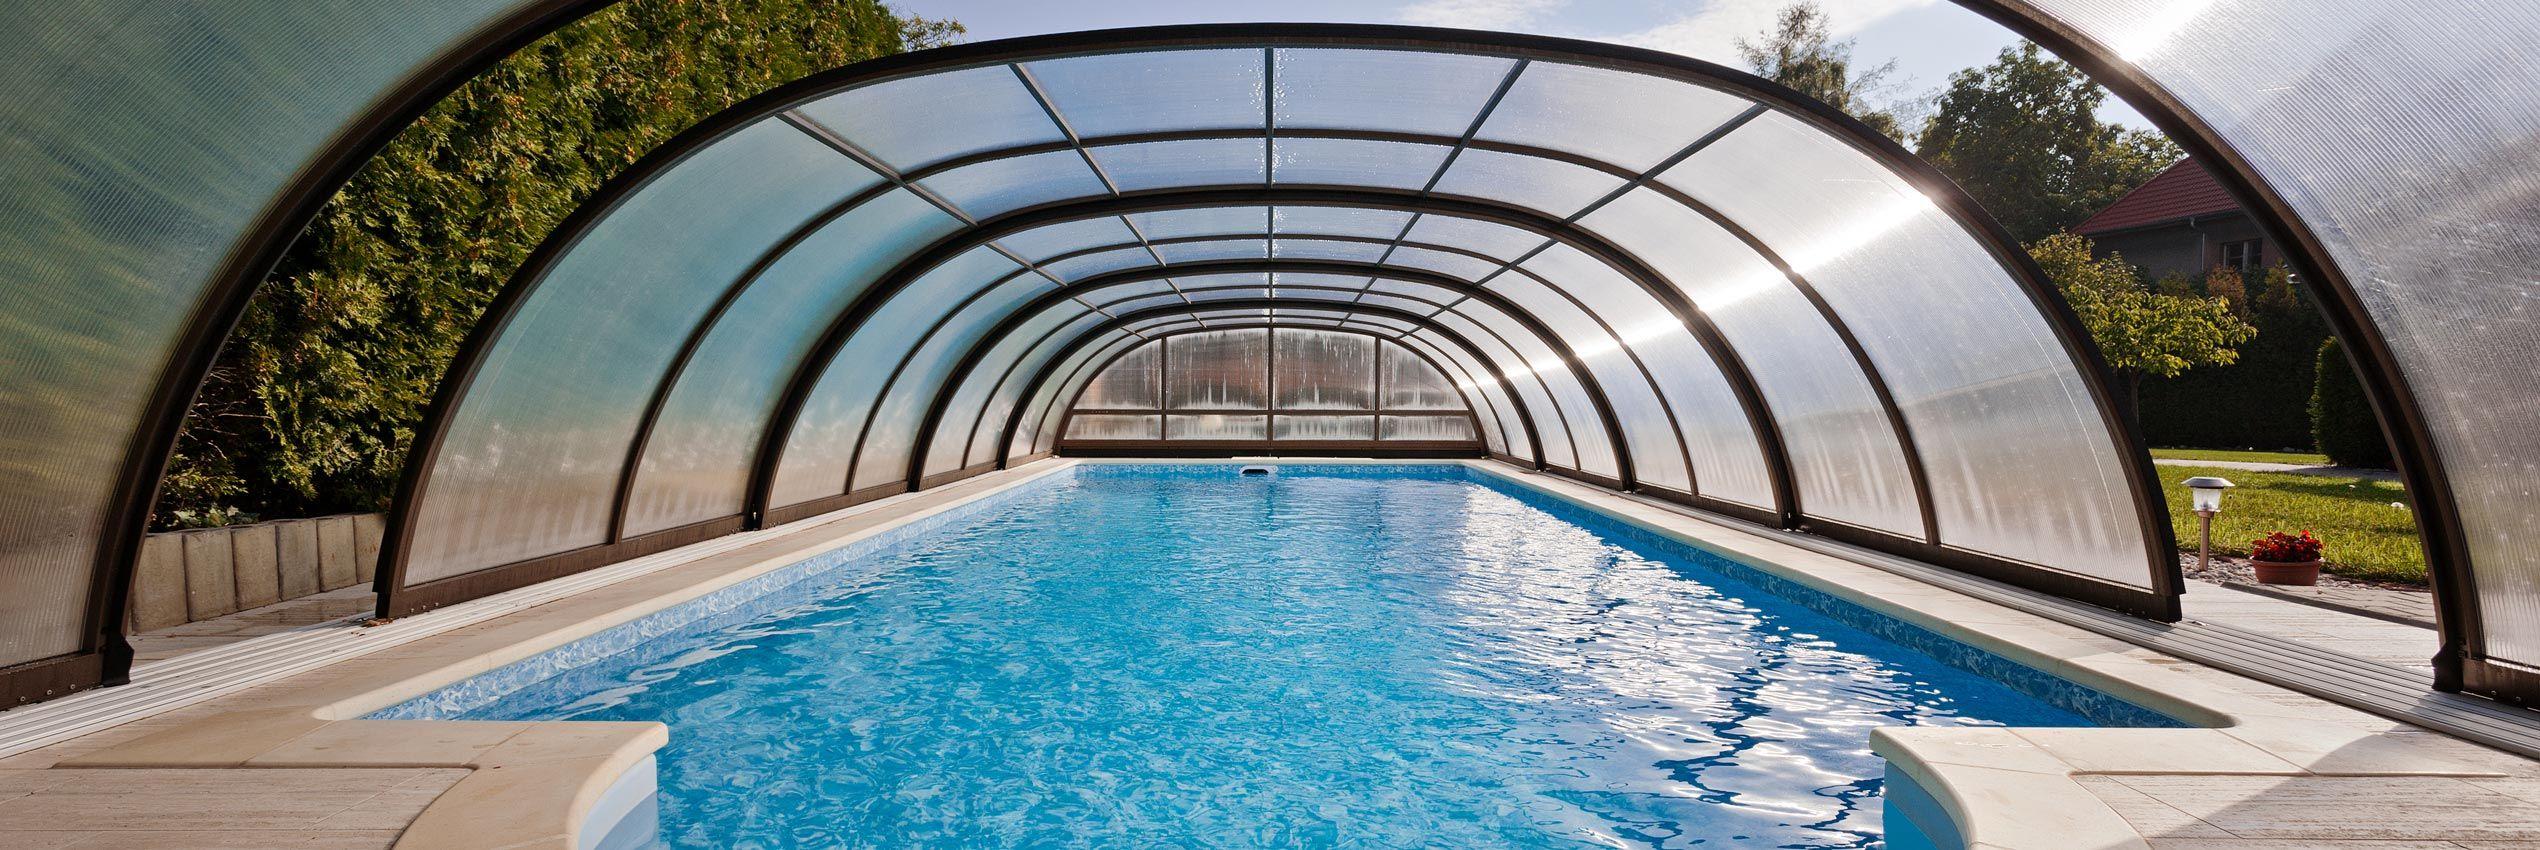 Copertura piscina aperta a metà Tropea NEO